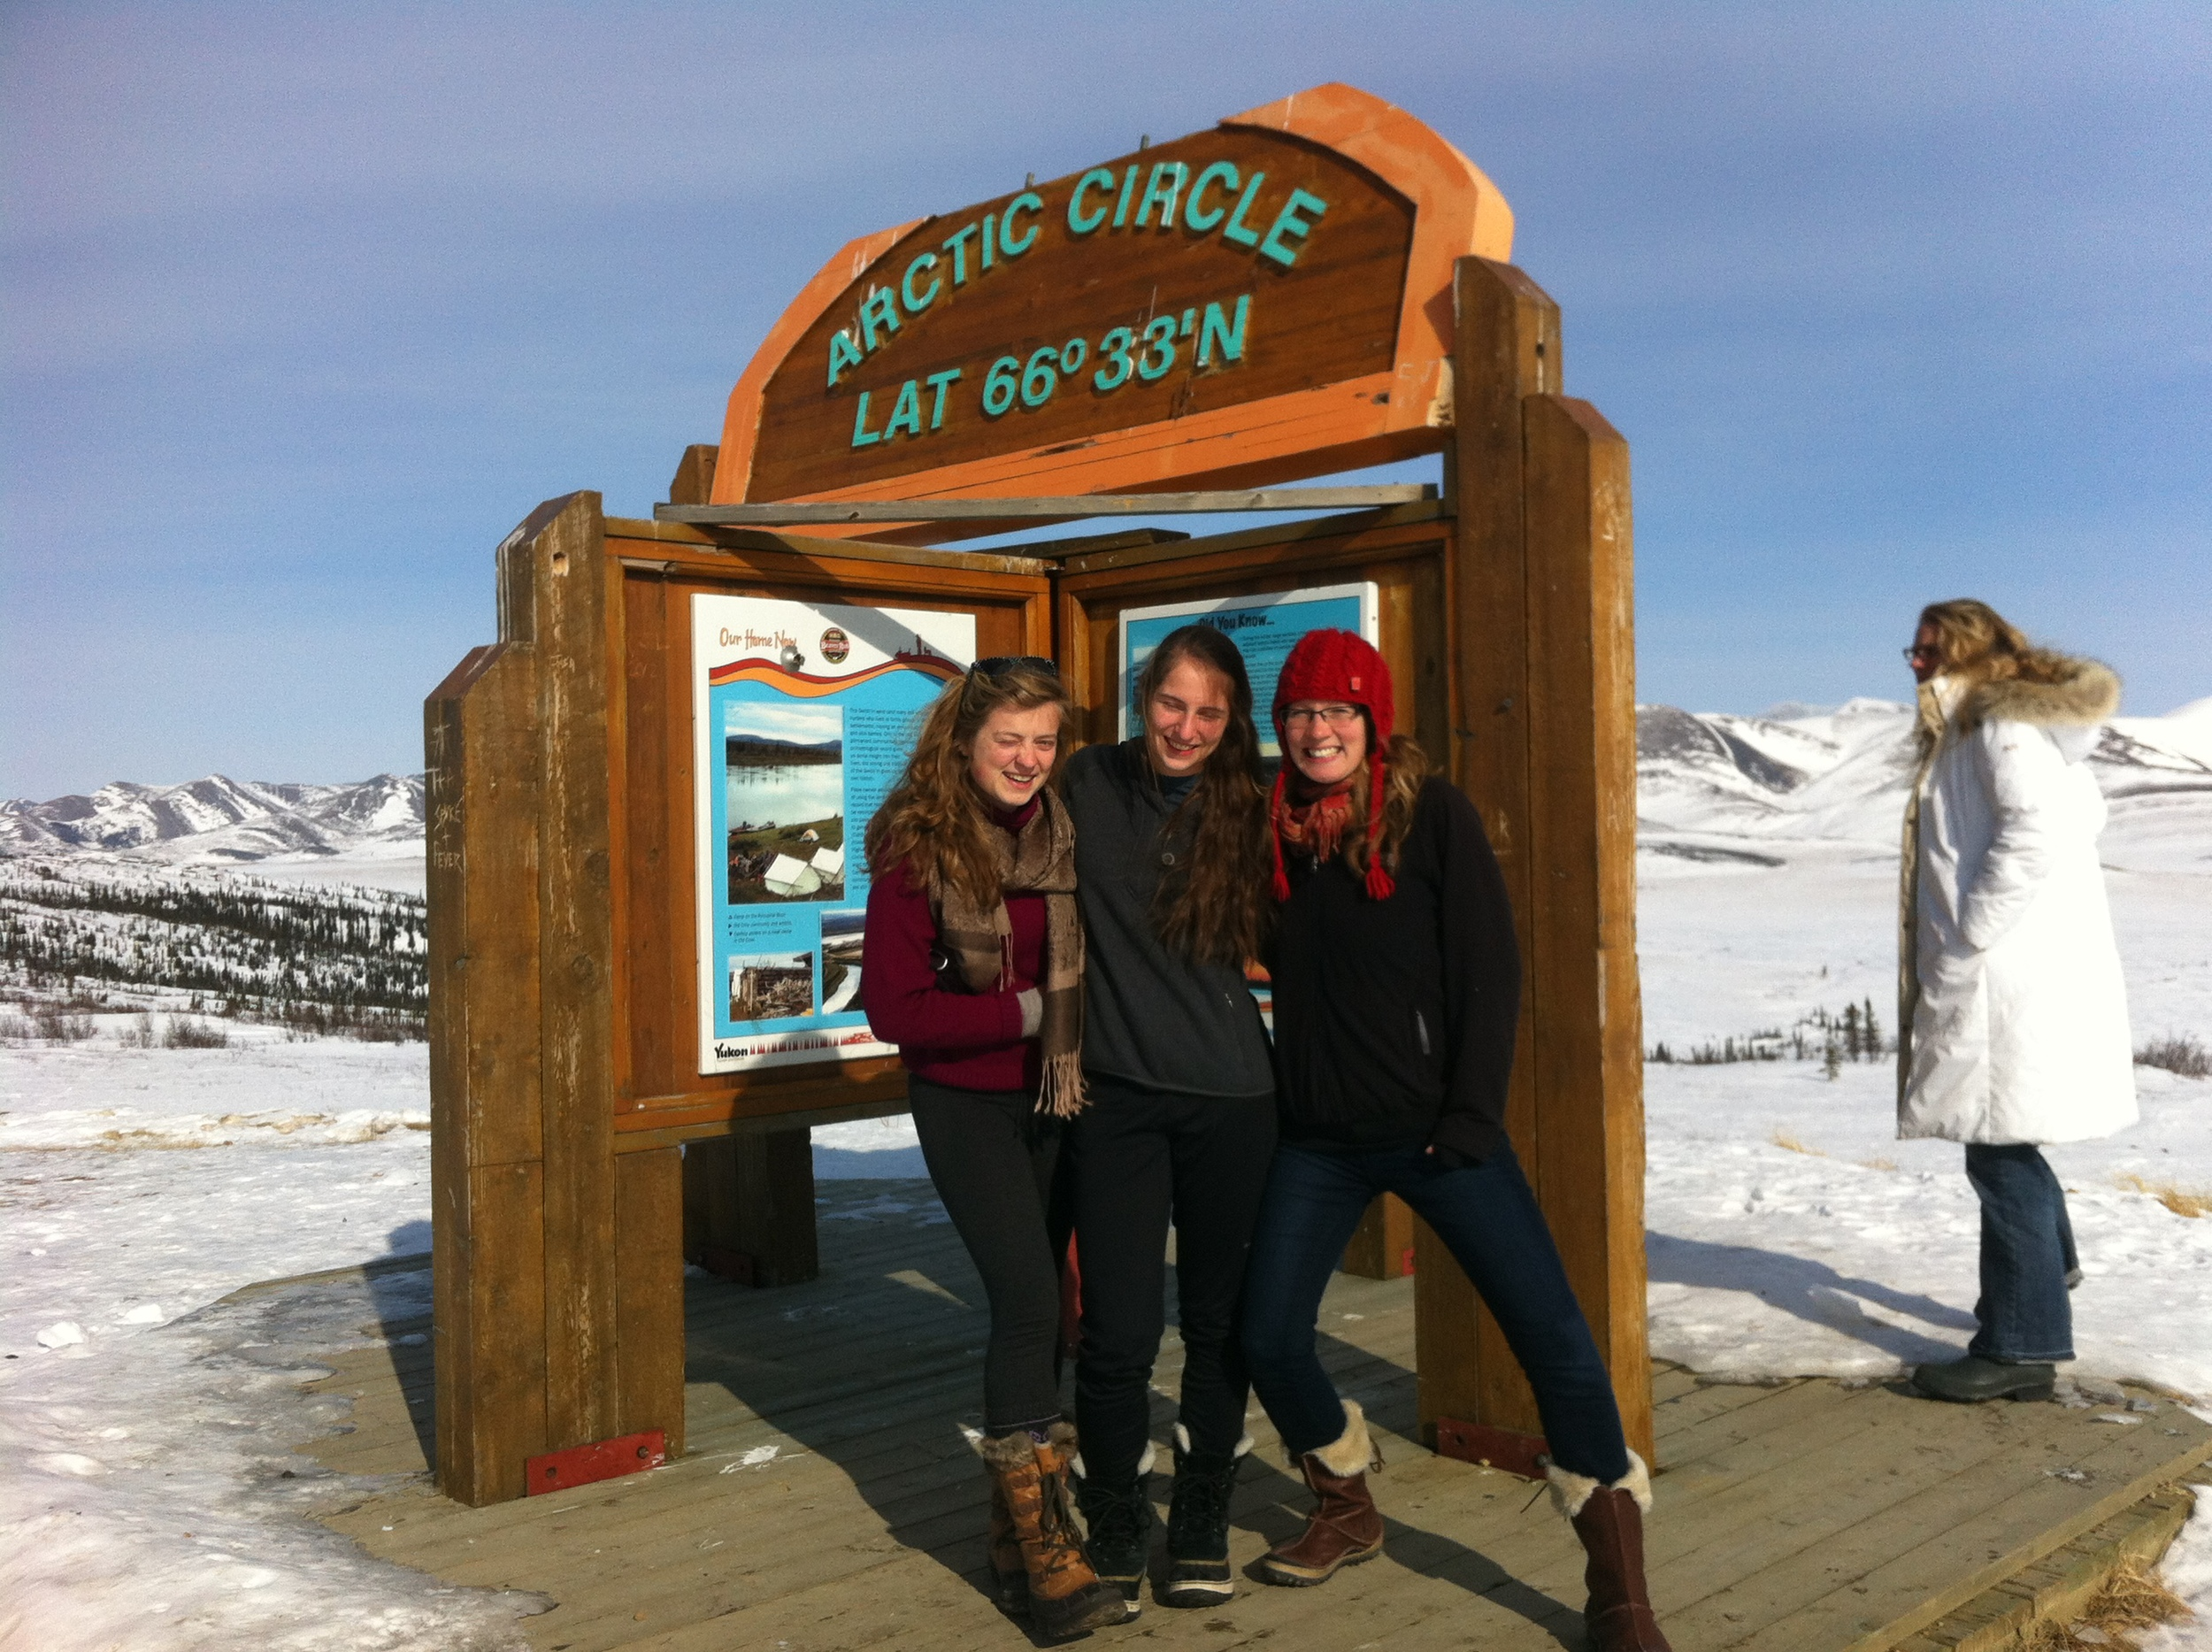 Chilling at the Arctic Circle...